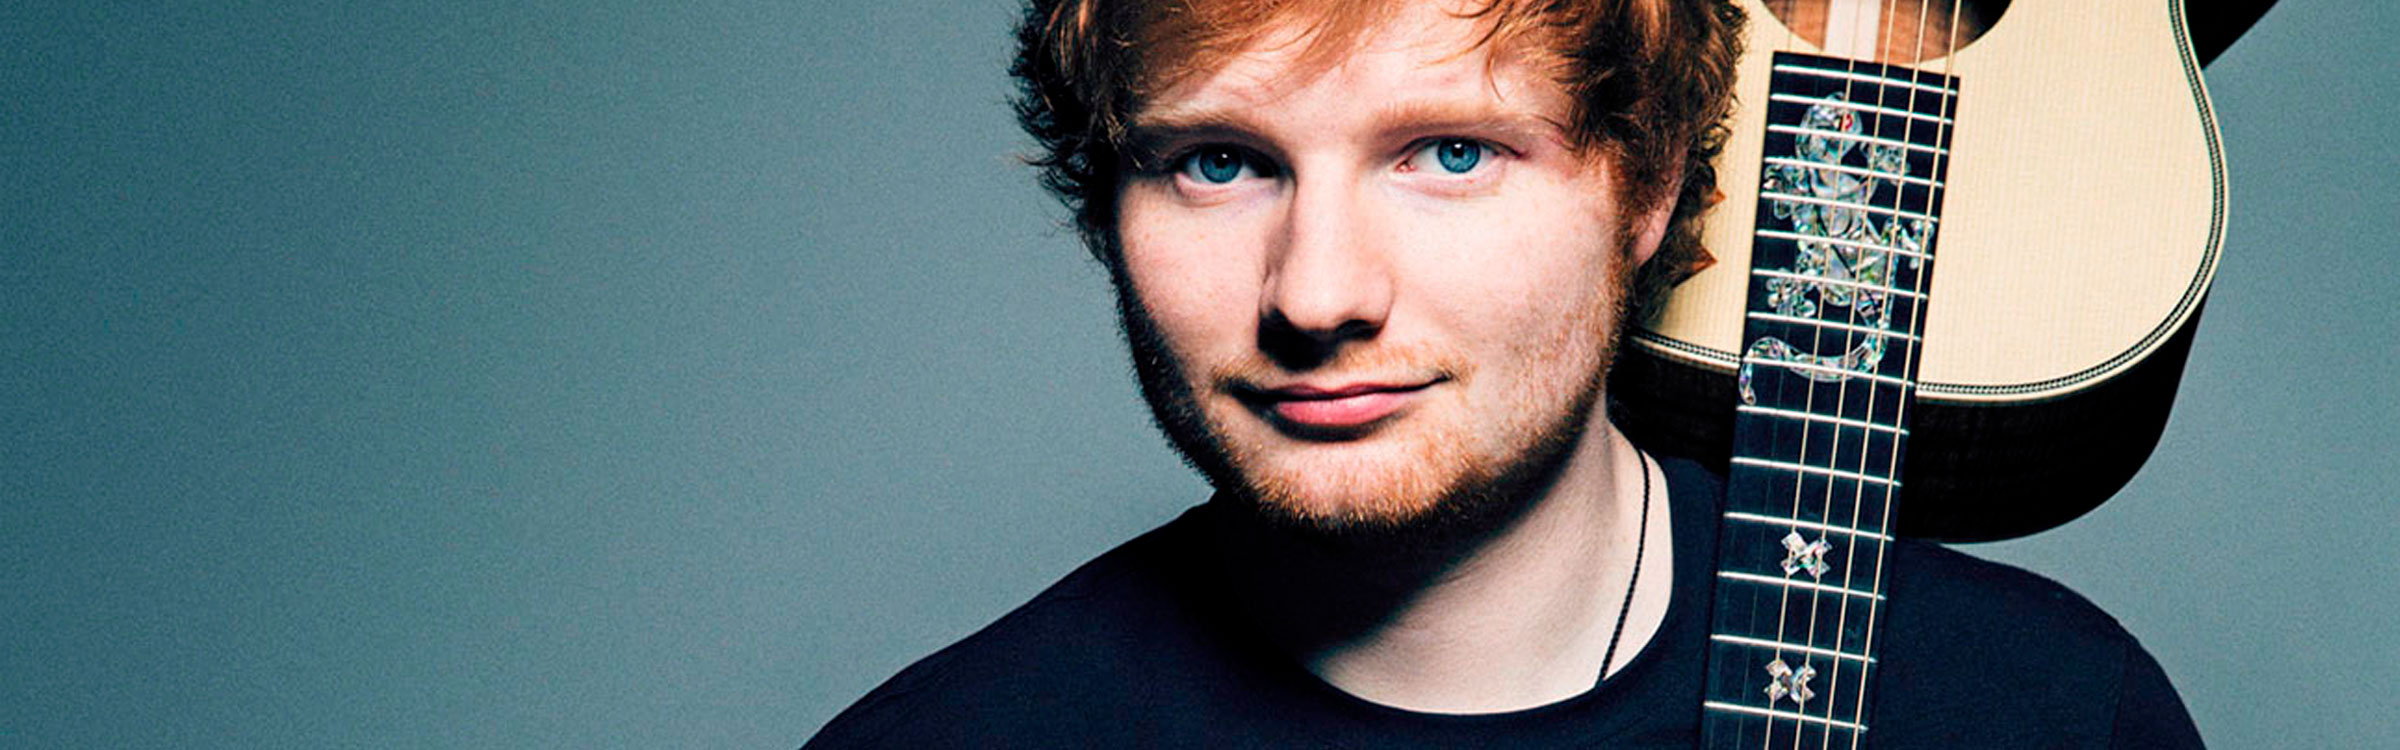 Ed spotify header